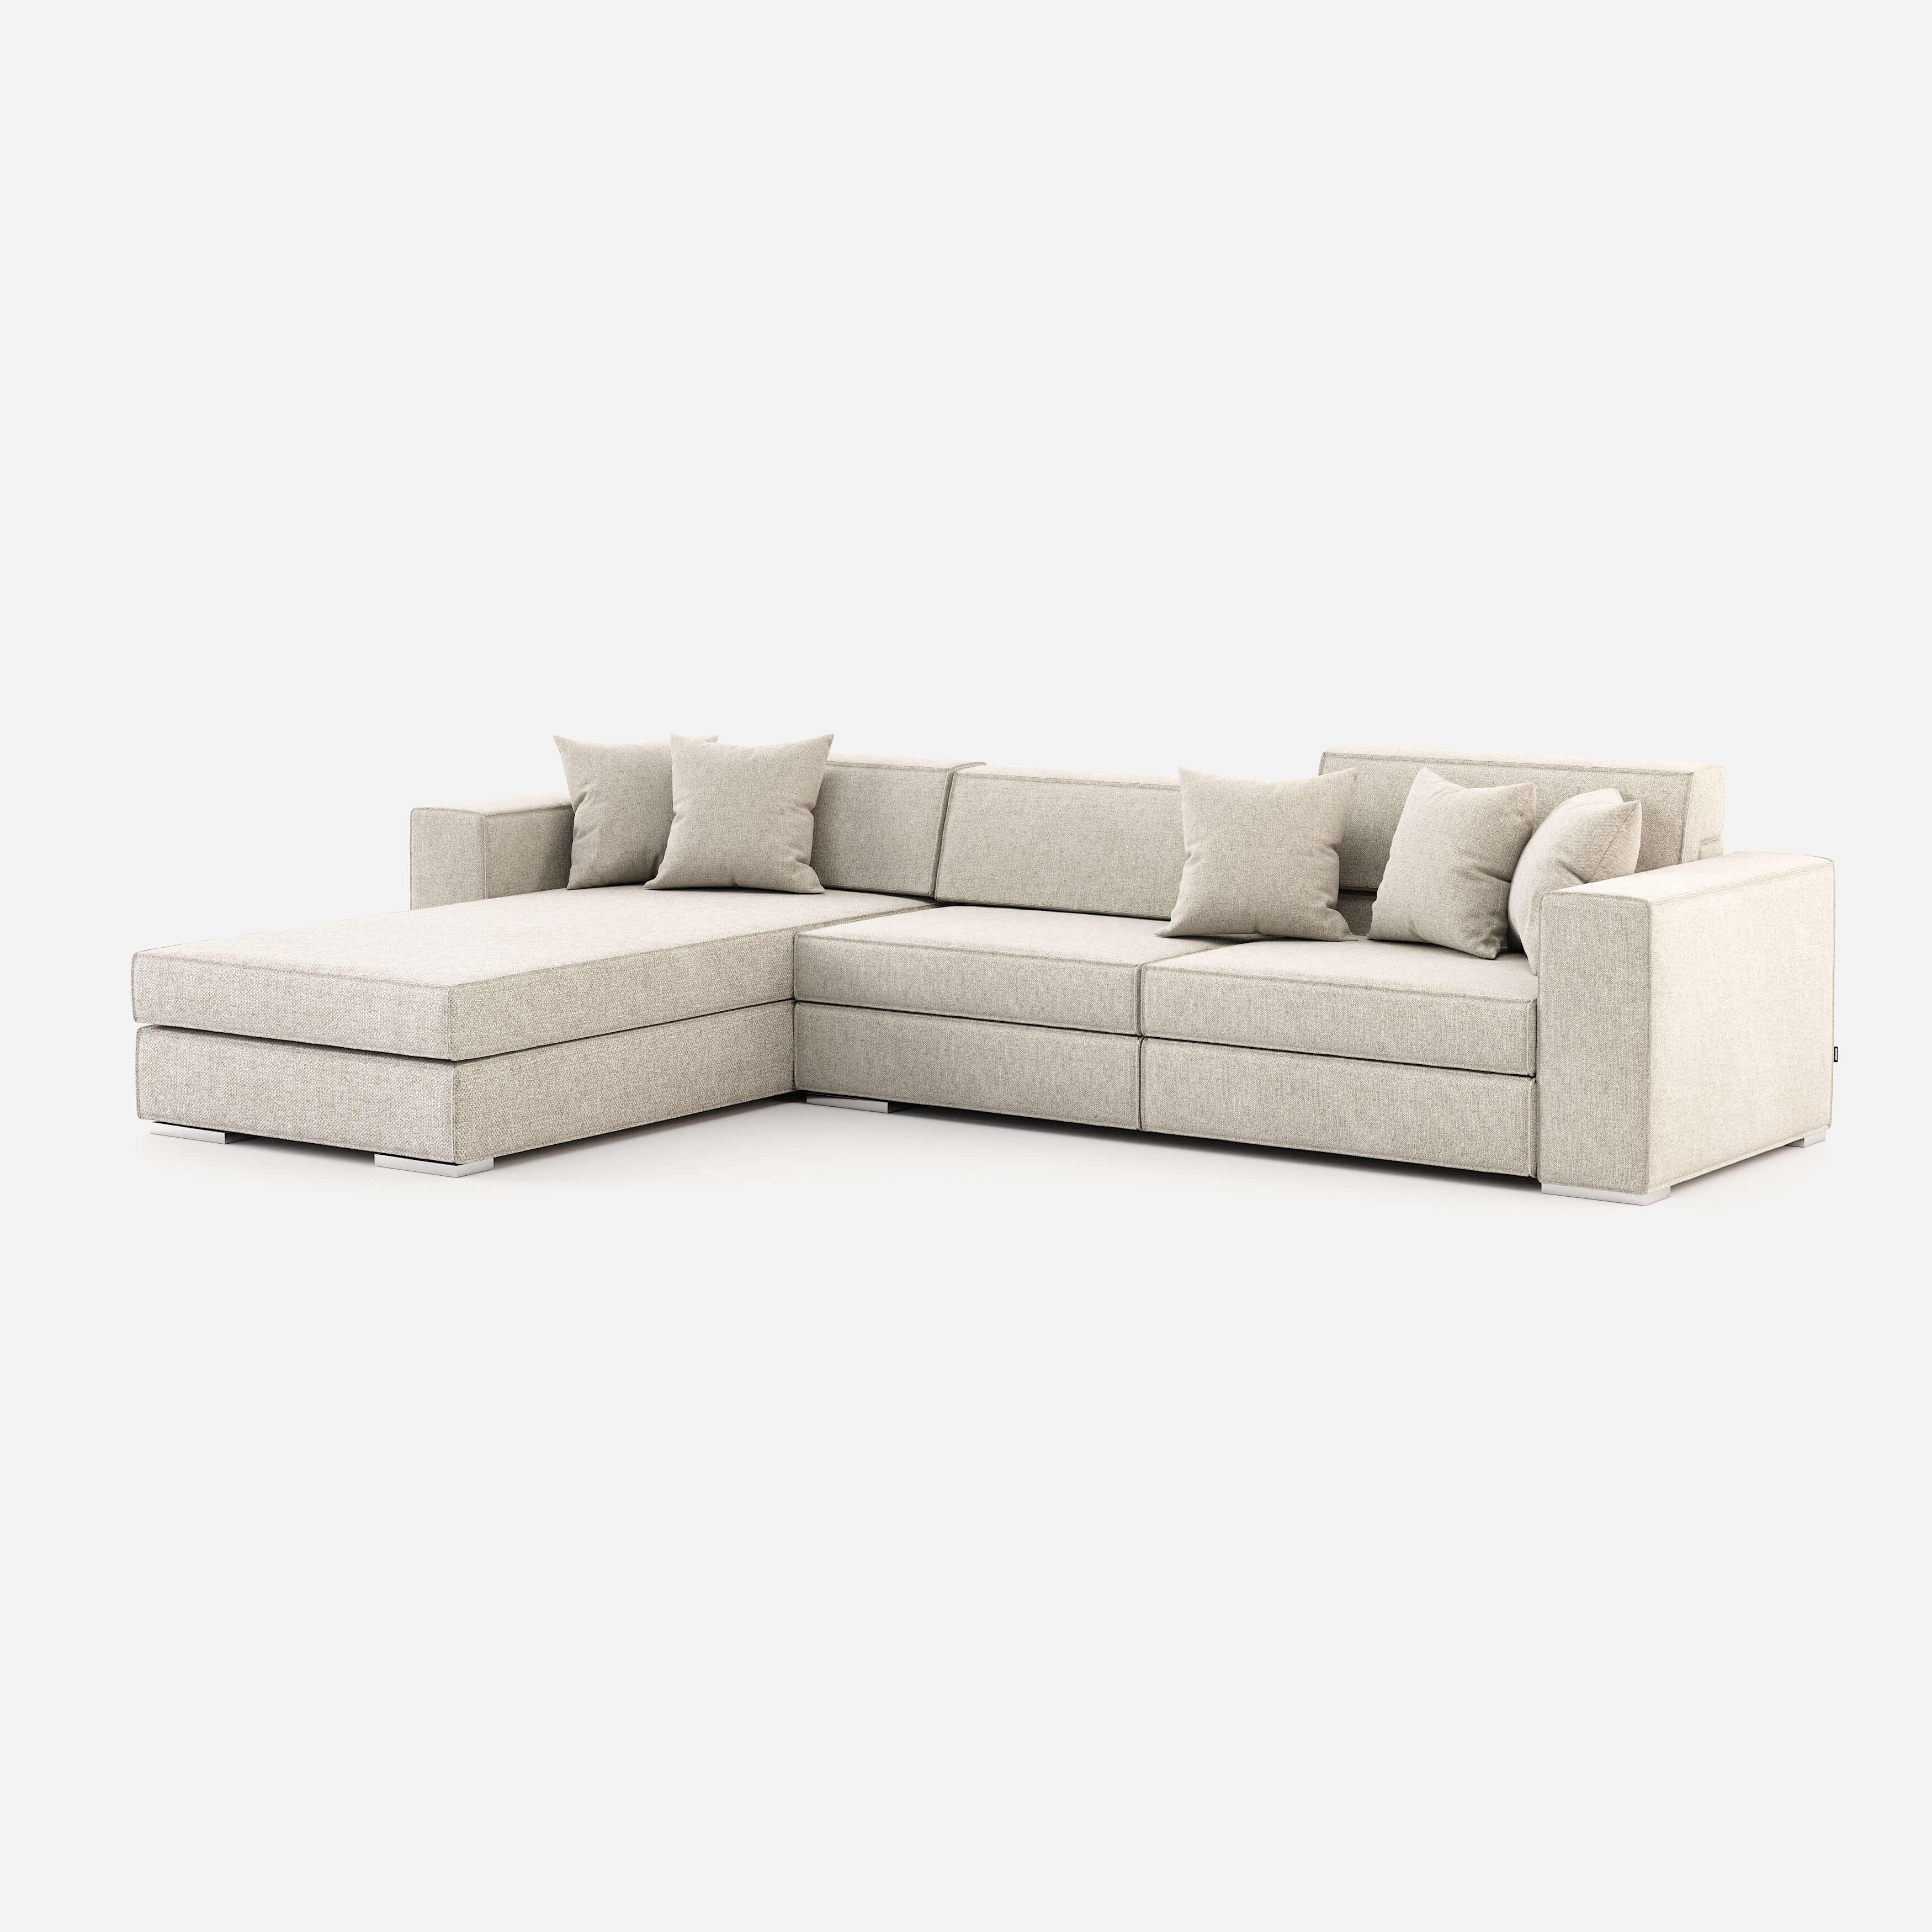 metis-sofa-coach-interior-design-home-decor-living-room-comfortable-modern-simple-cosy-upholstered-furniture-domkapa-1